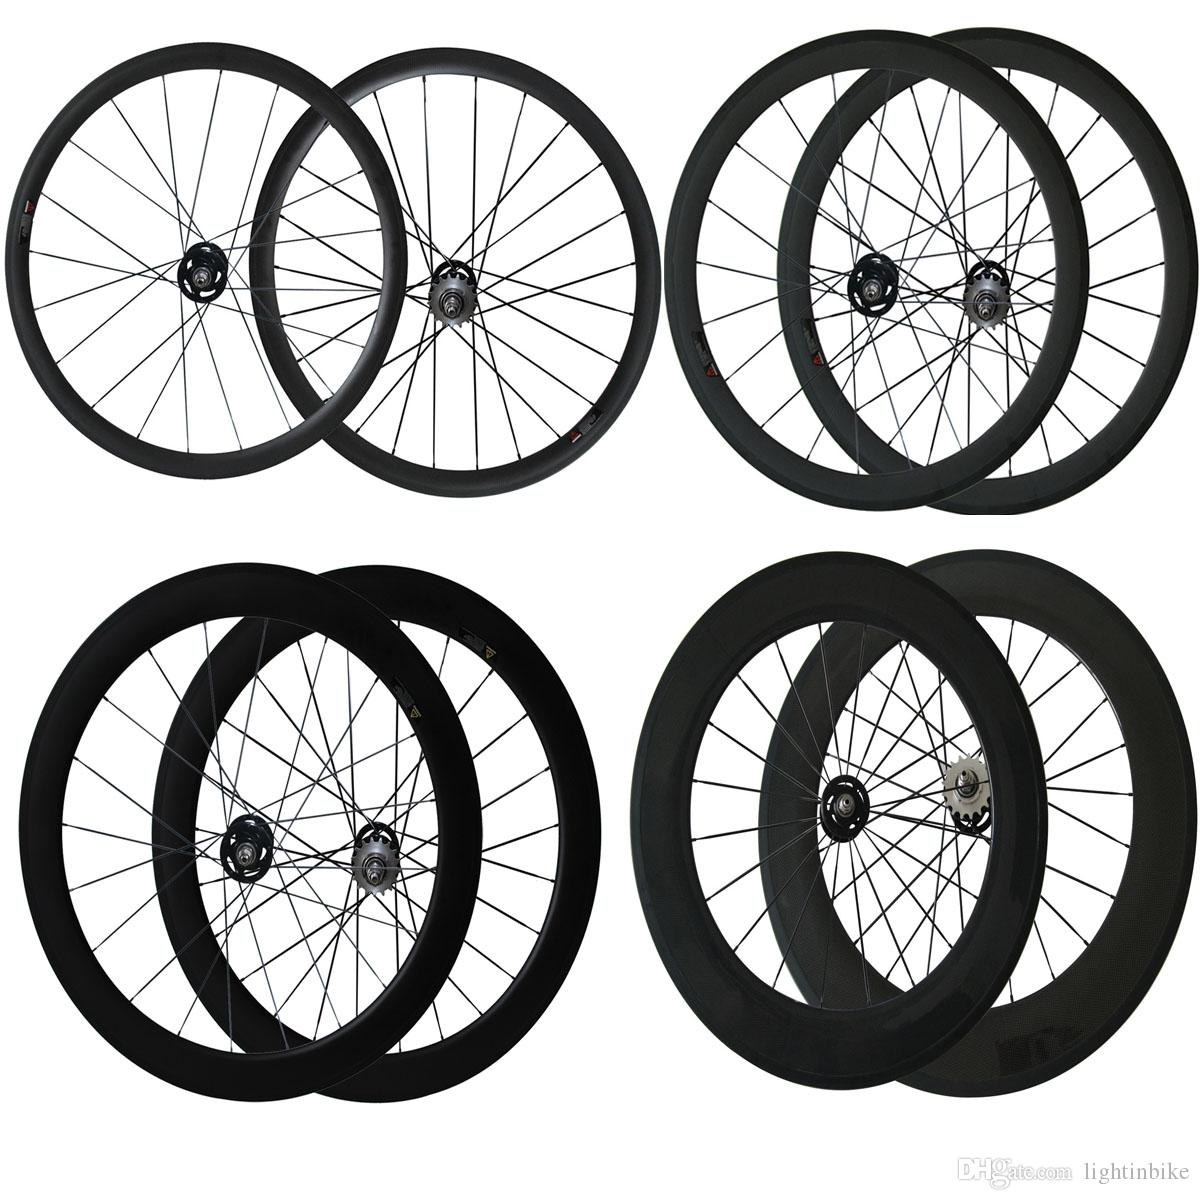 700C Track bike Wheels 24mm 38mm 50mm 60mm 88mm Fix Gear Wheelset Clincher Tubular Fix Gear Wheels Carbon Bike Wheelset for Track Bike